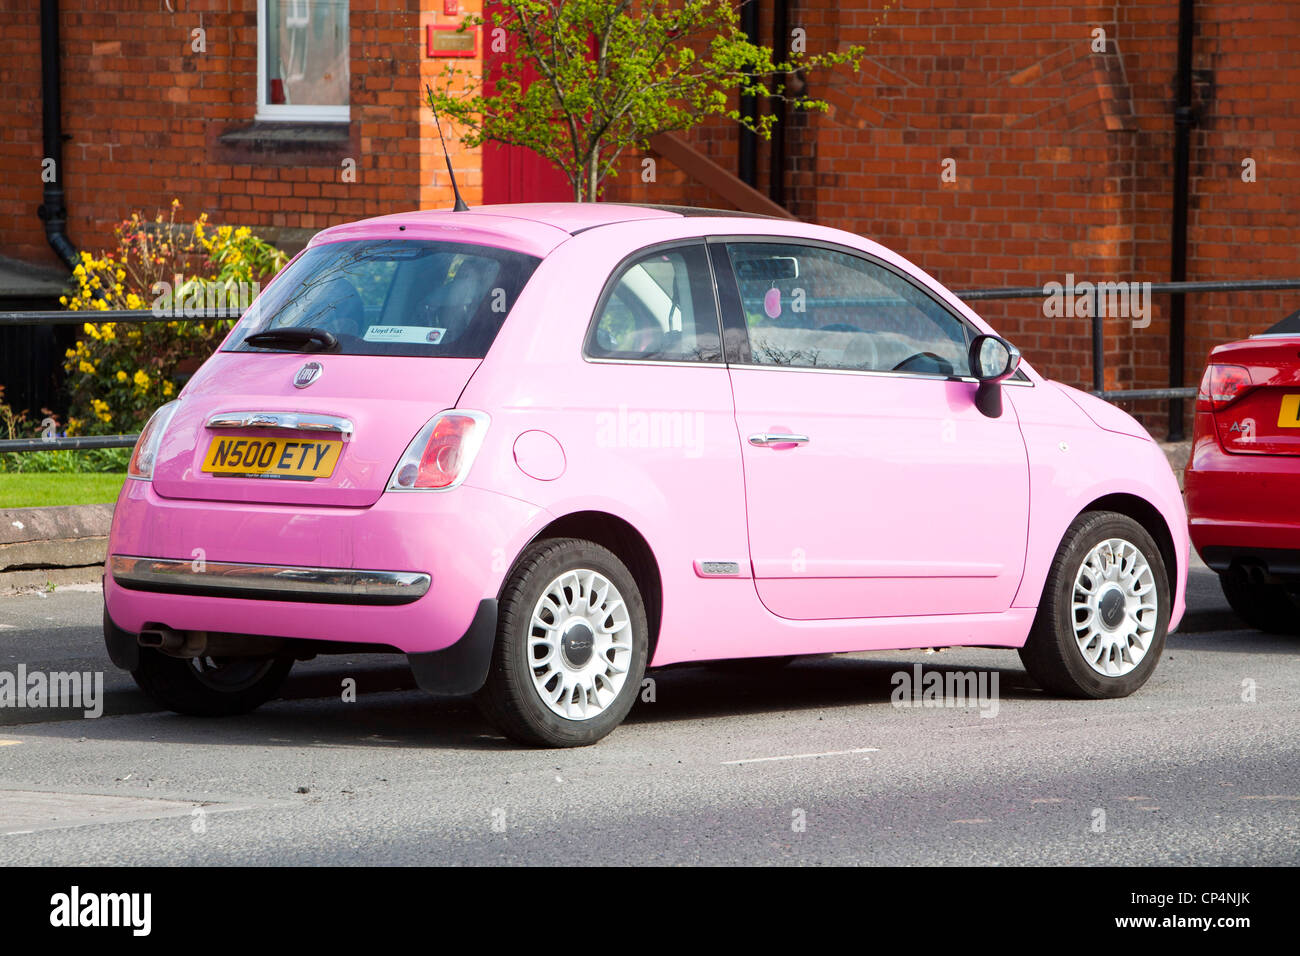 Ein rosa Fiat 500, das bis zu 70 pro Gallone Auto in Carlisle, Cumbria, UK. Stockfoto